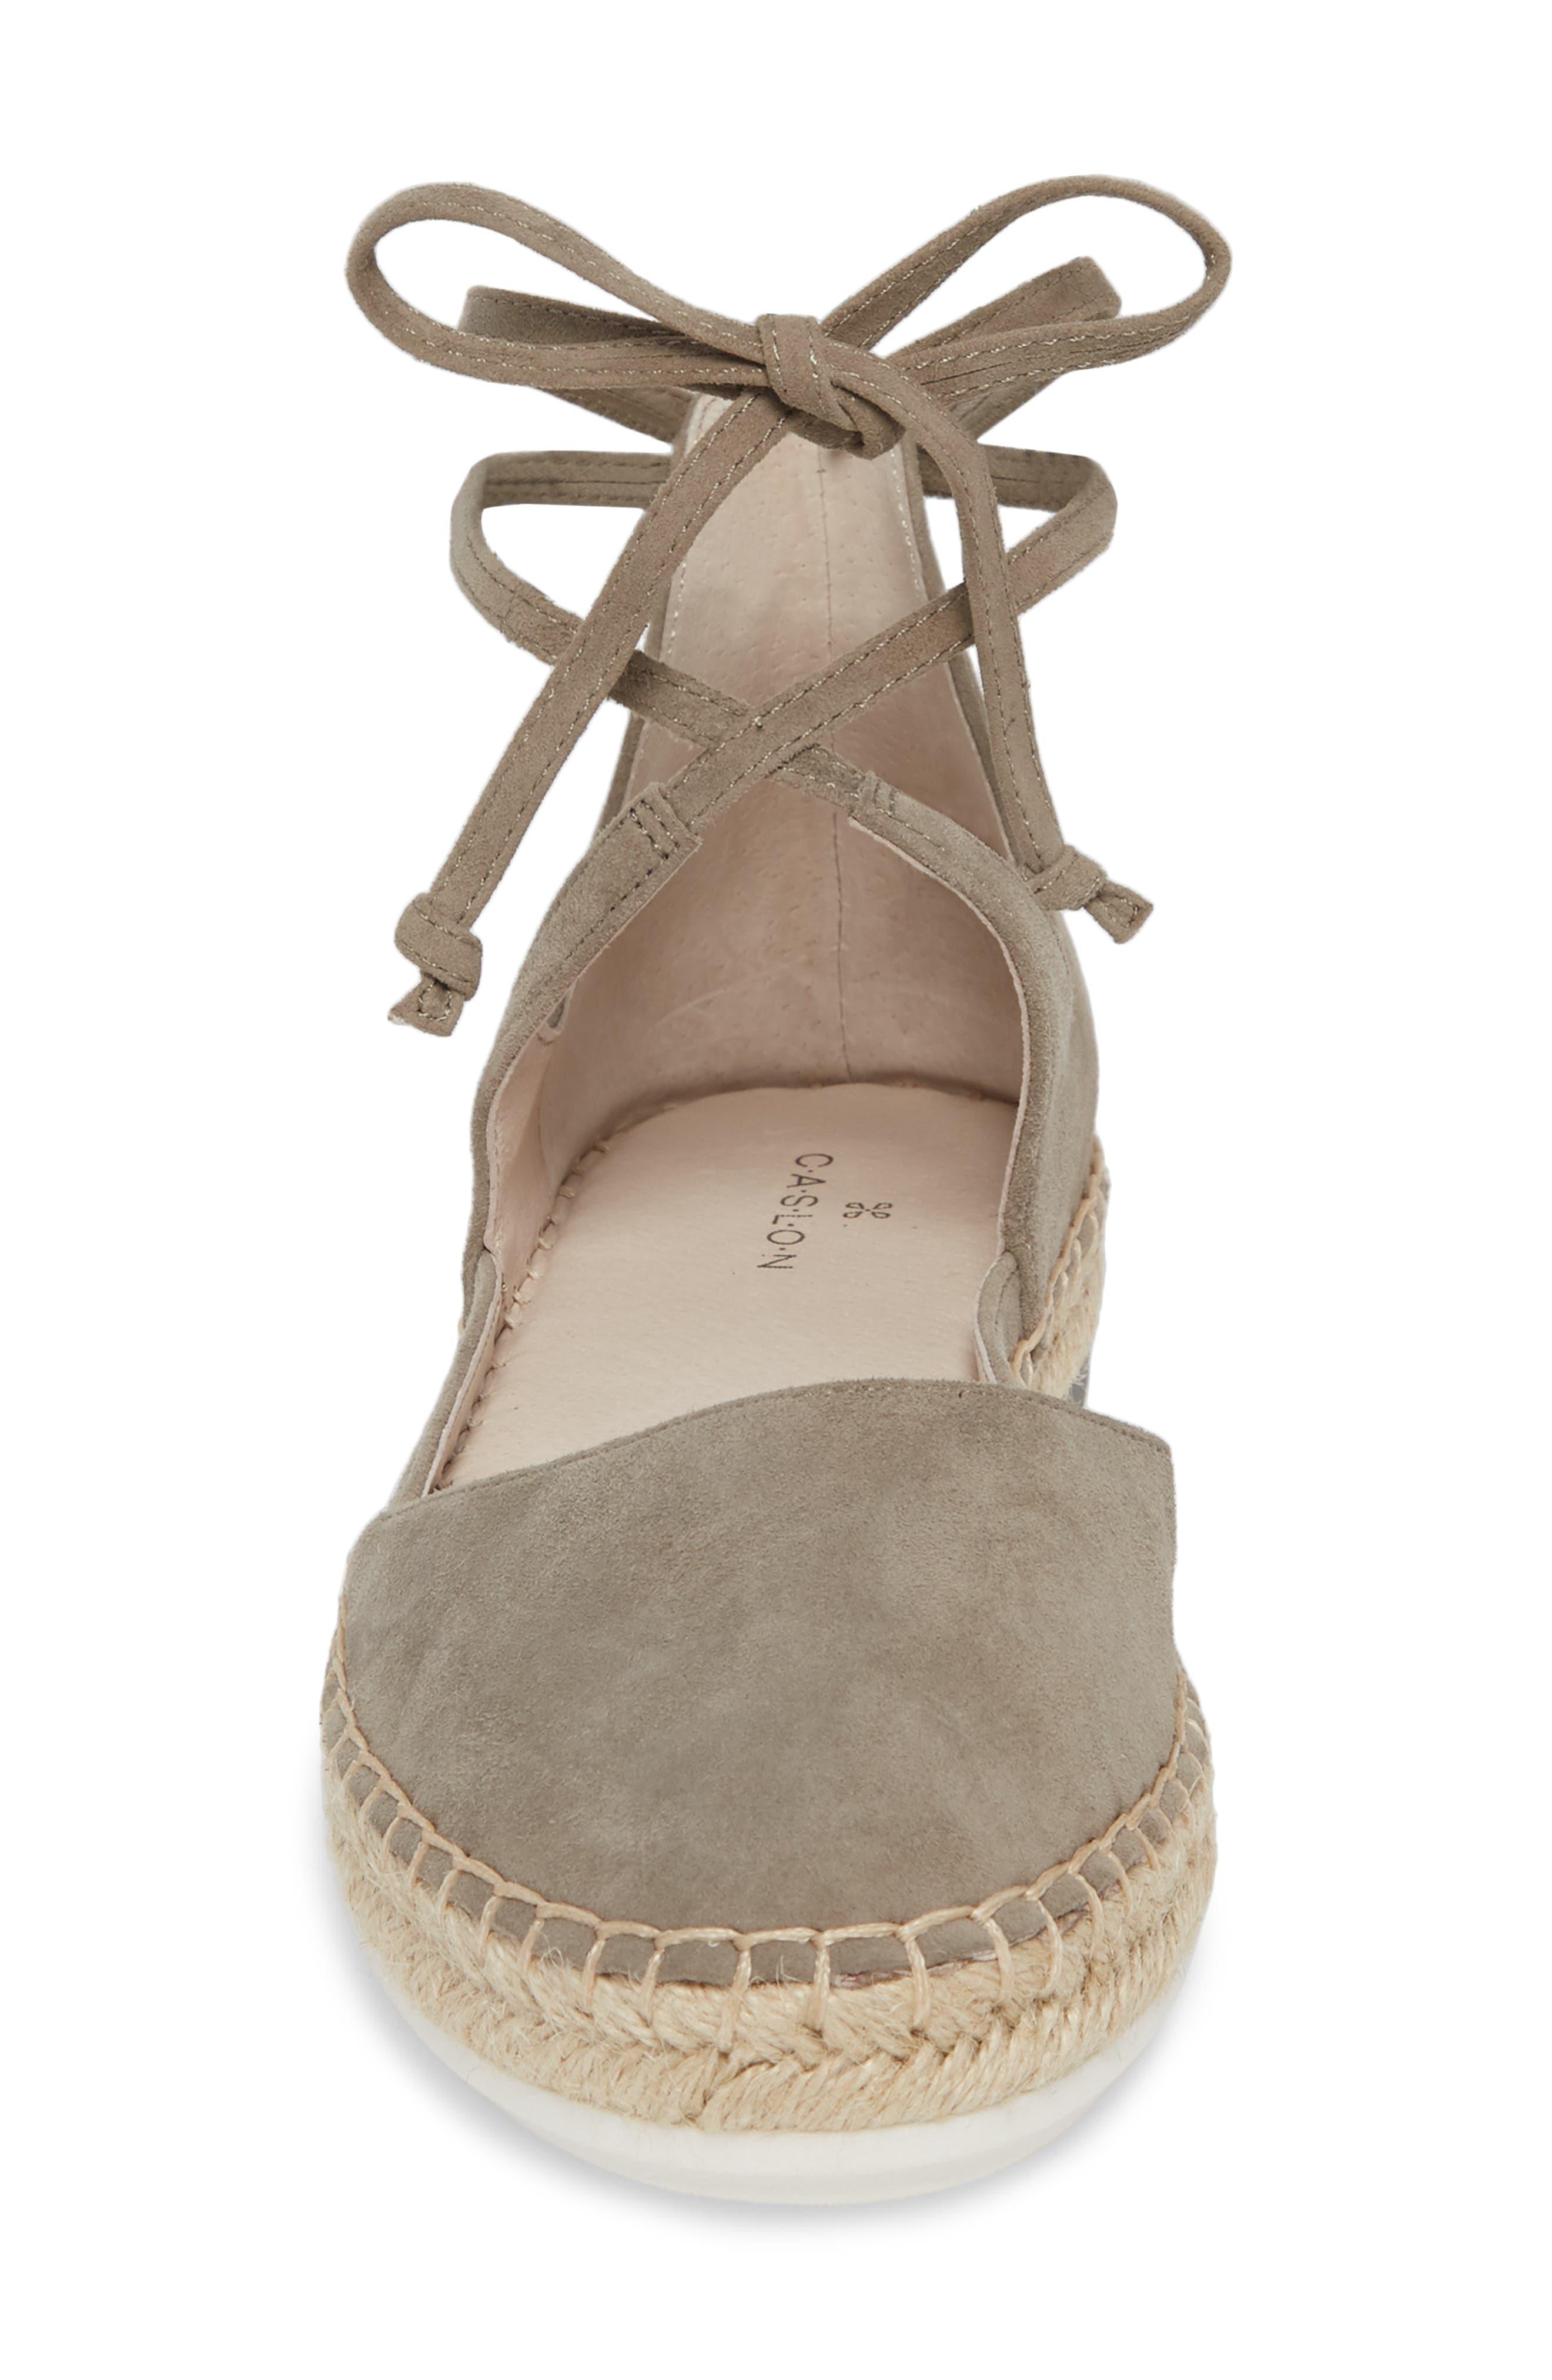 Leena Ankle Strap Sandal,                             Alternate thumbnail 4, color,                             030